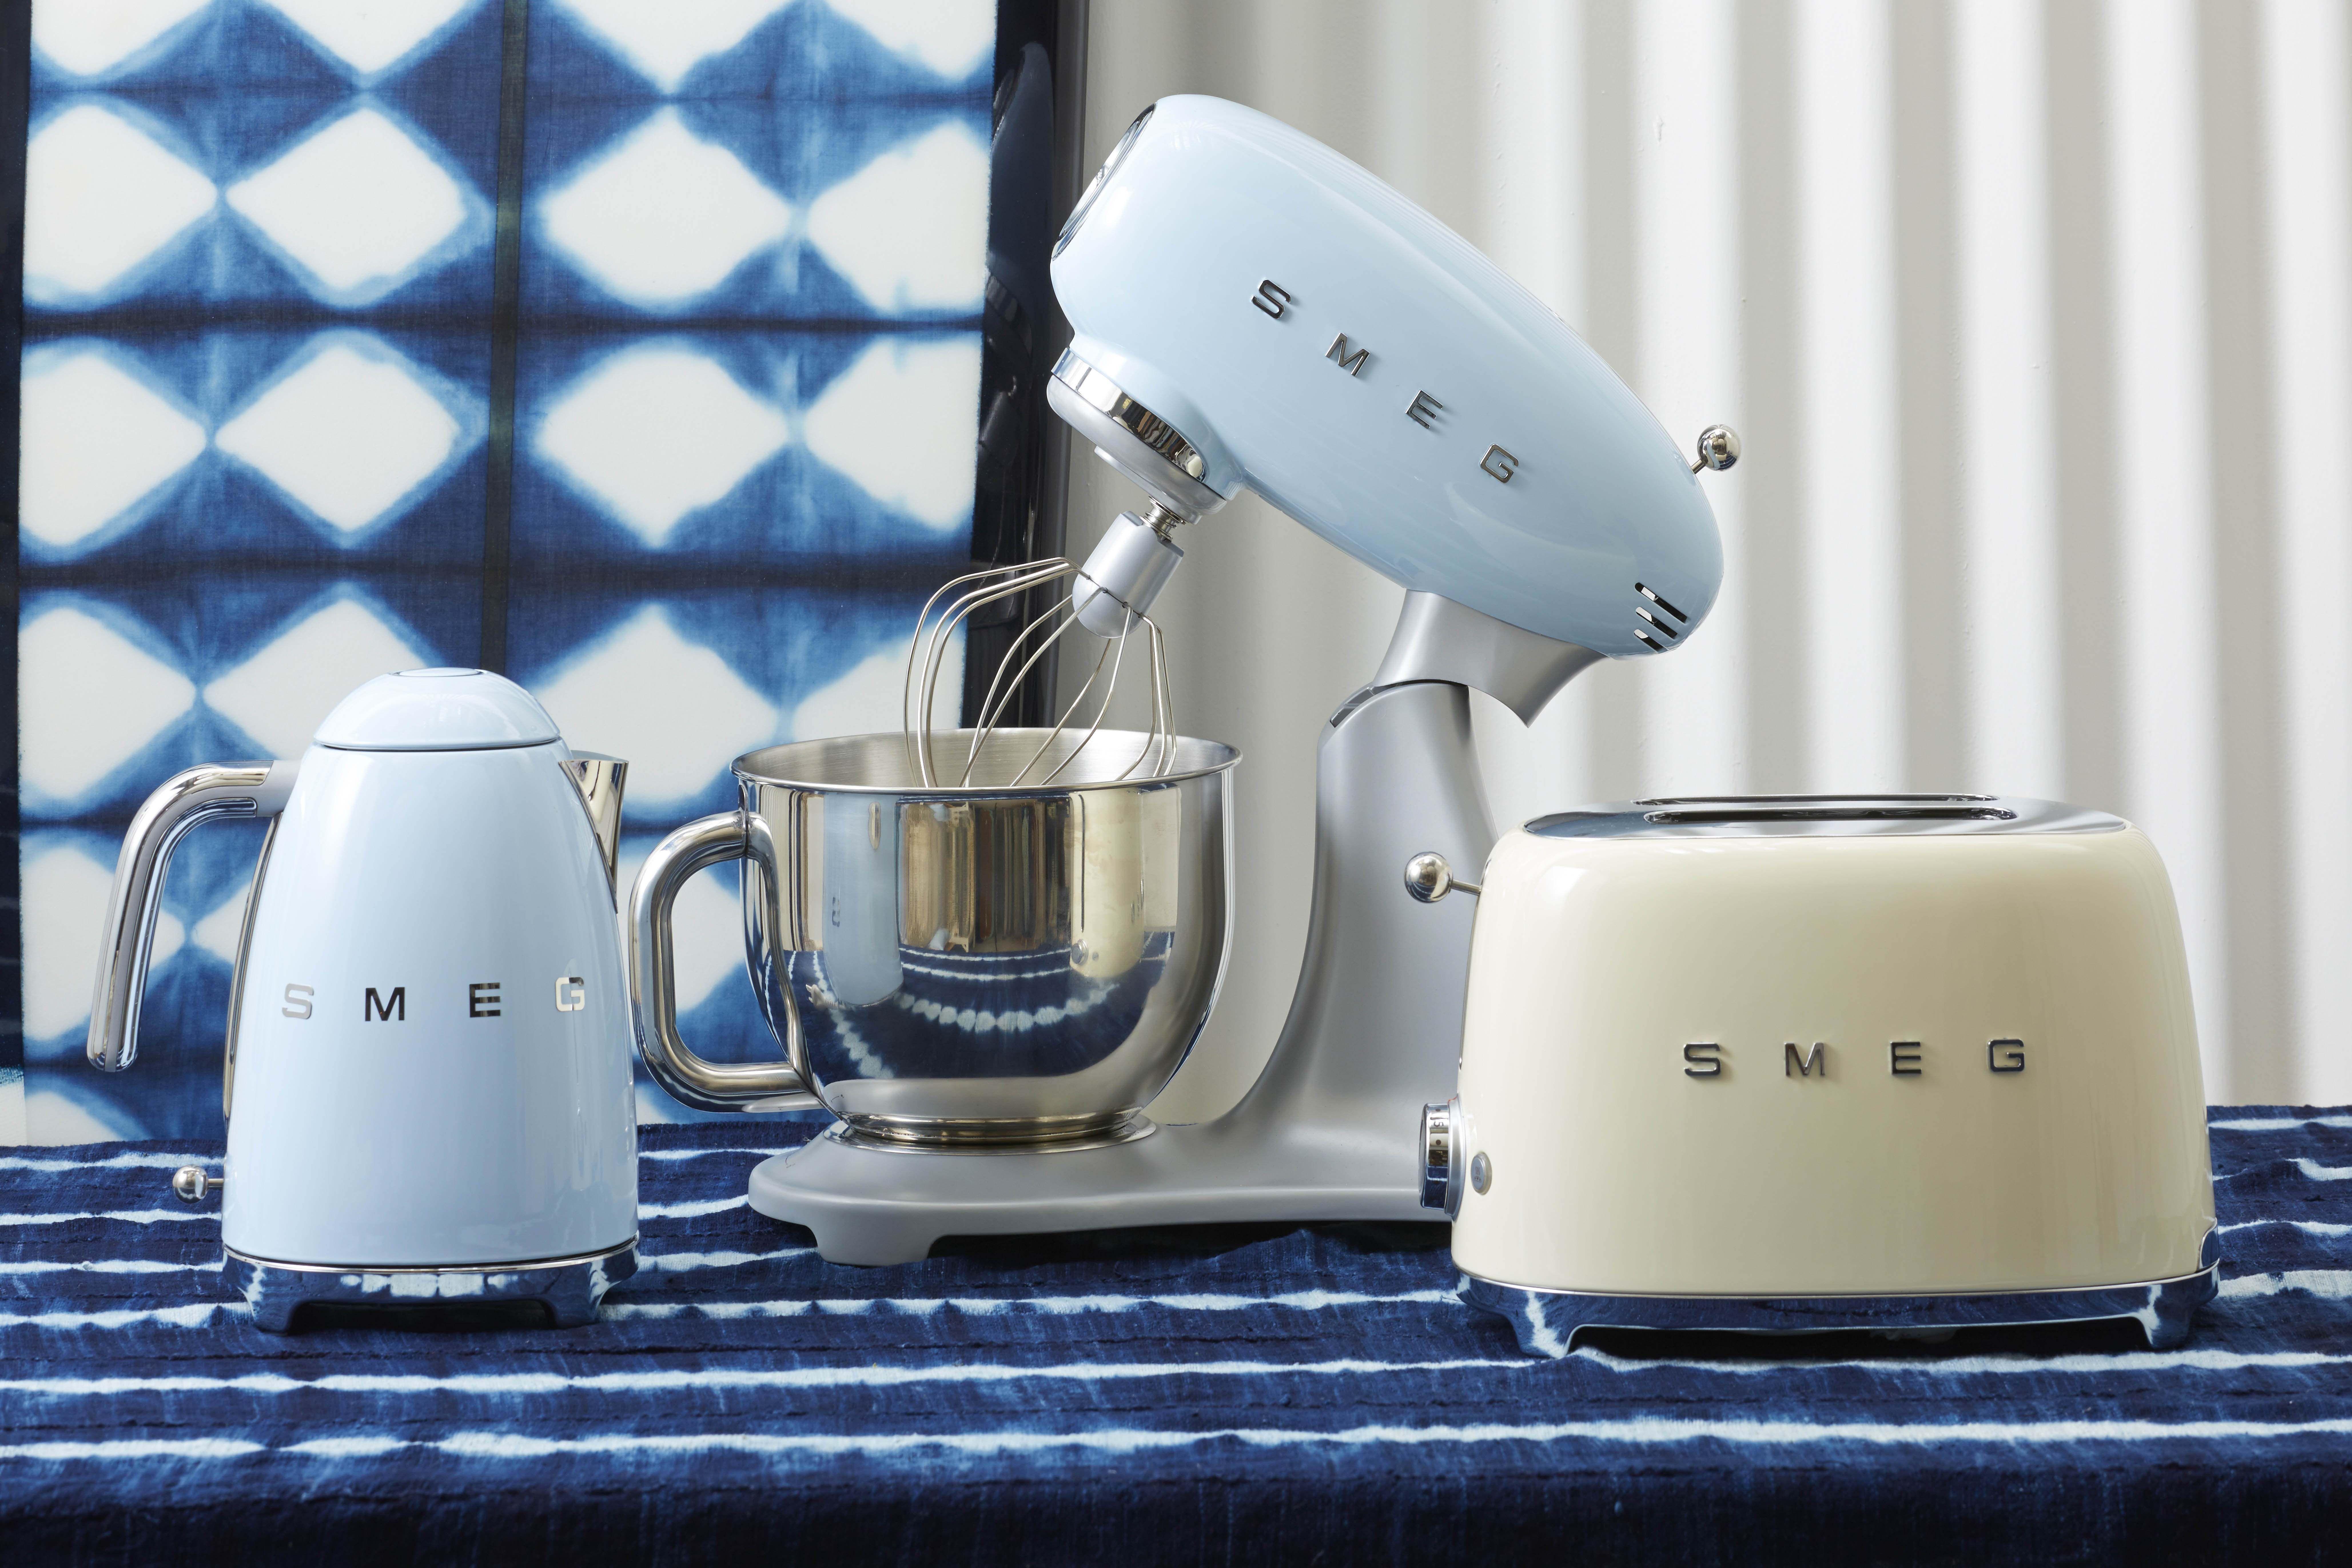 Smeg Small Appliances Finally Available In Australia Small